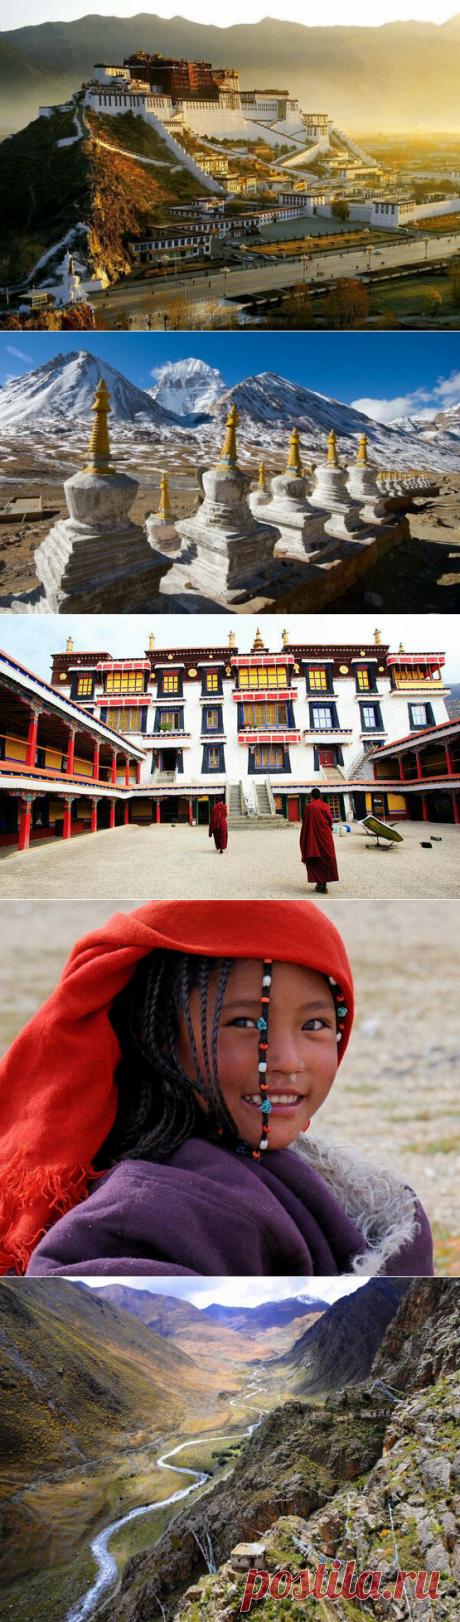 Тибет - путешествие в древнюю культуру с своими тайнами и суевериями | Travel Best | Яндекс Дзен